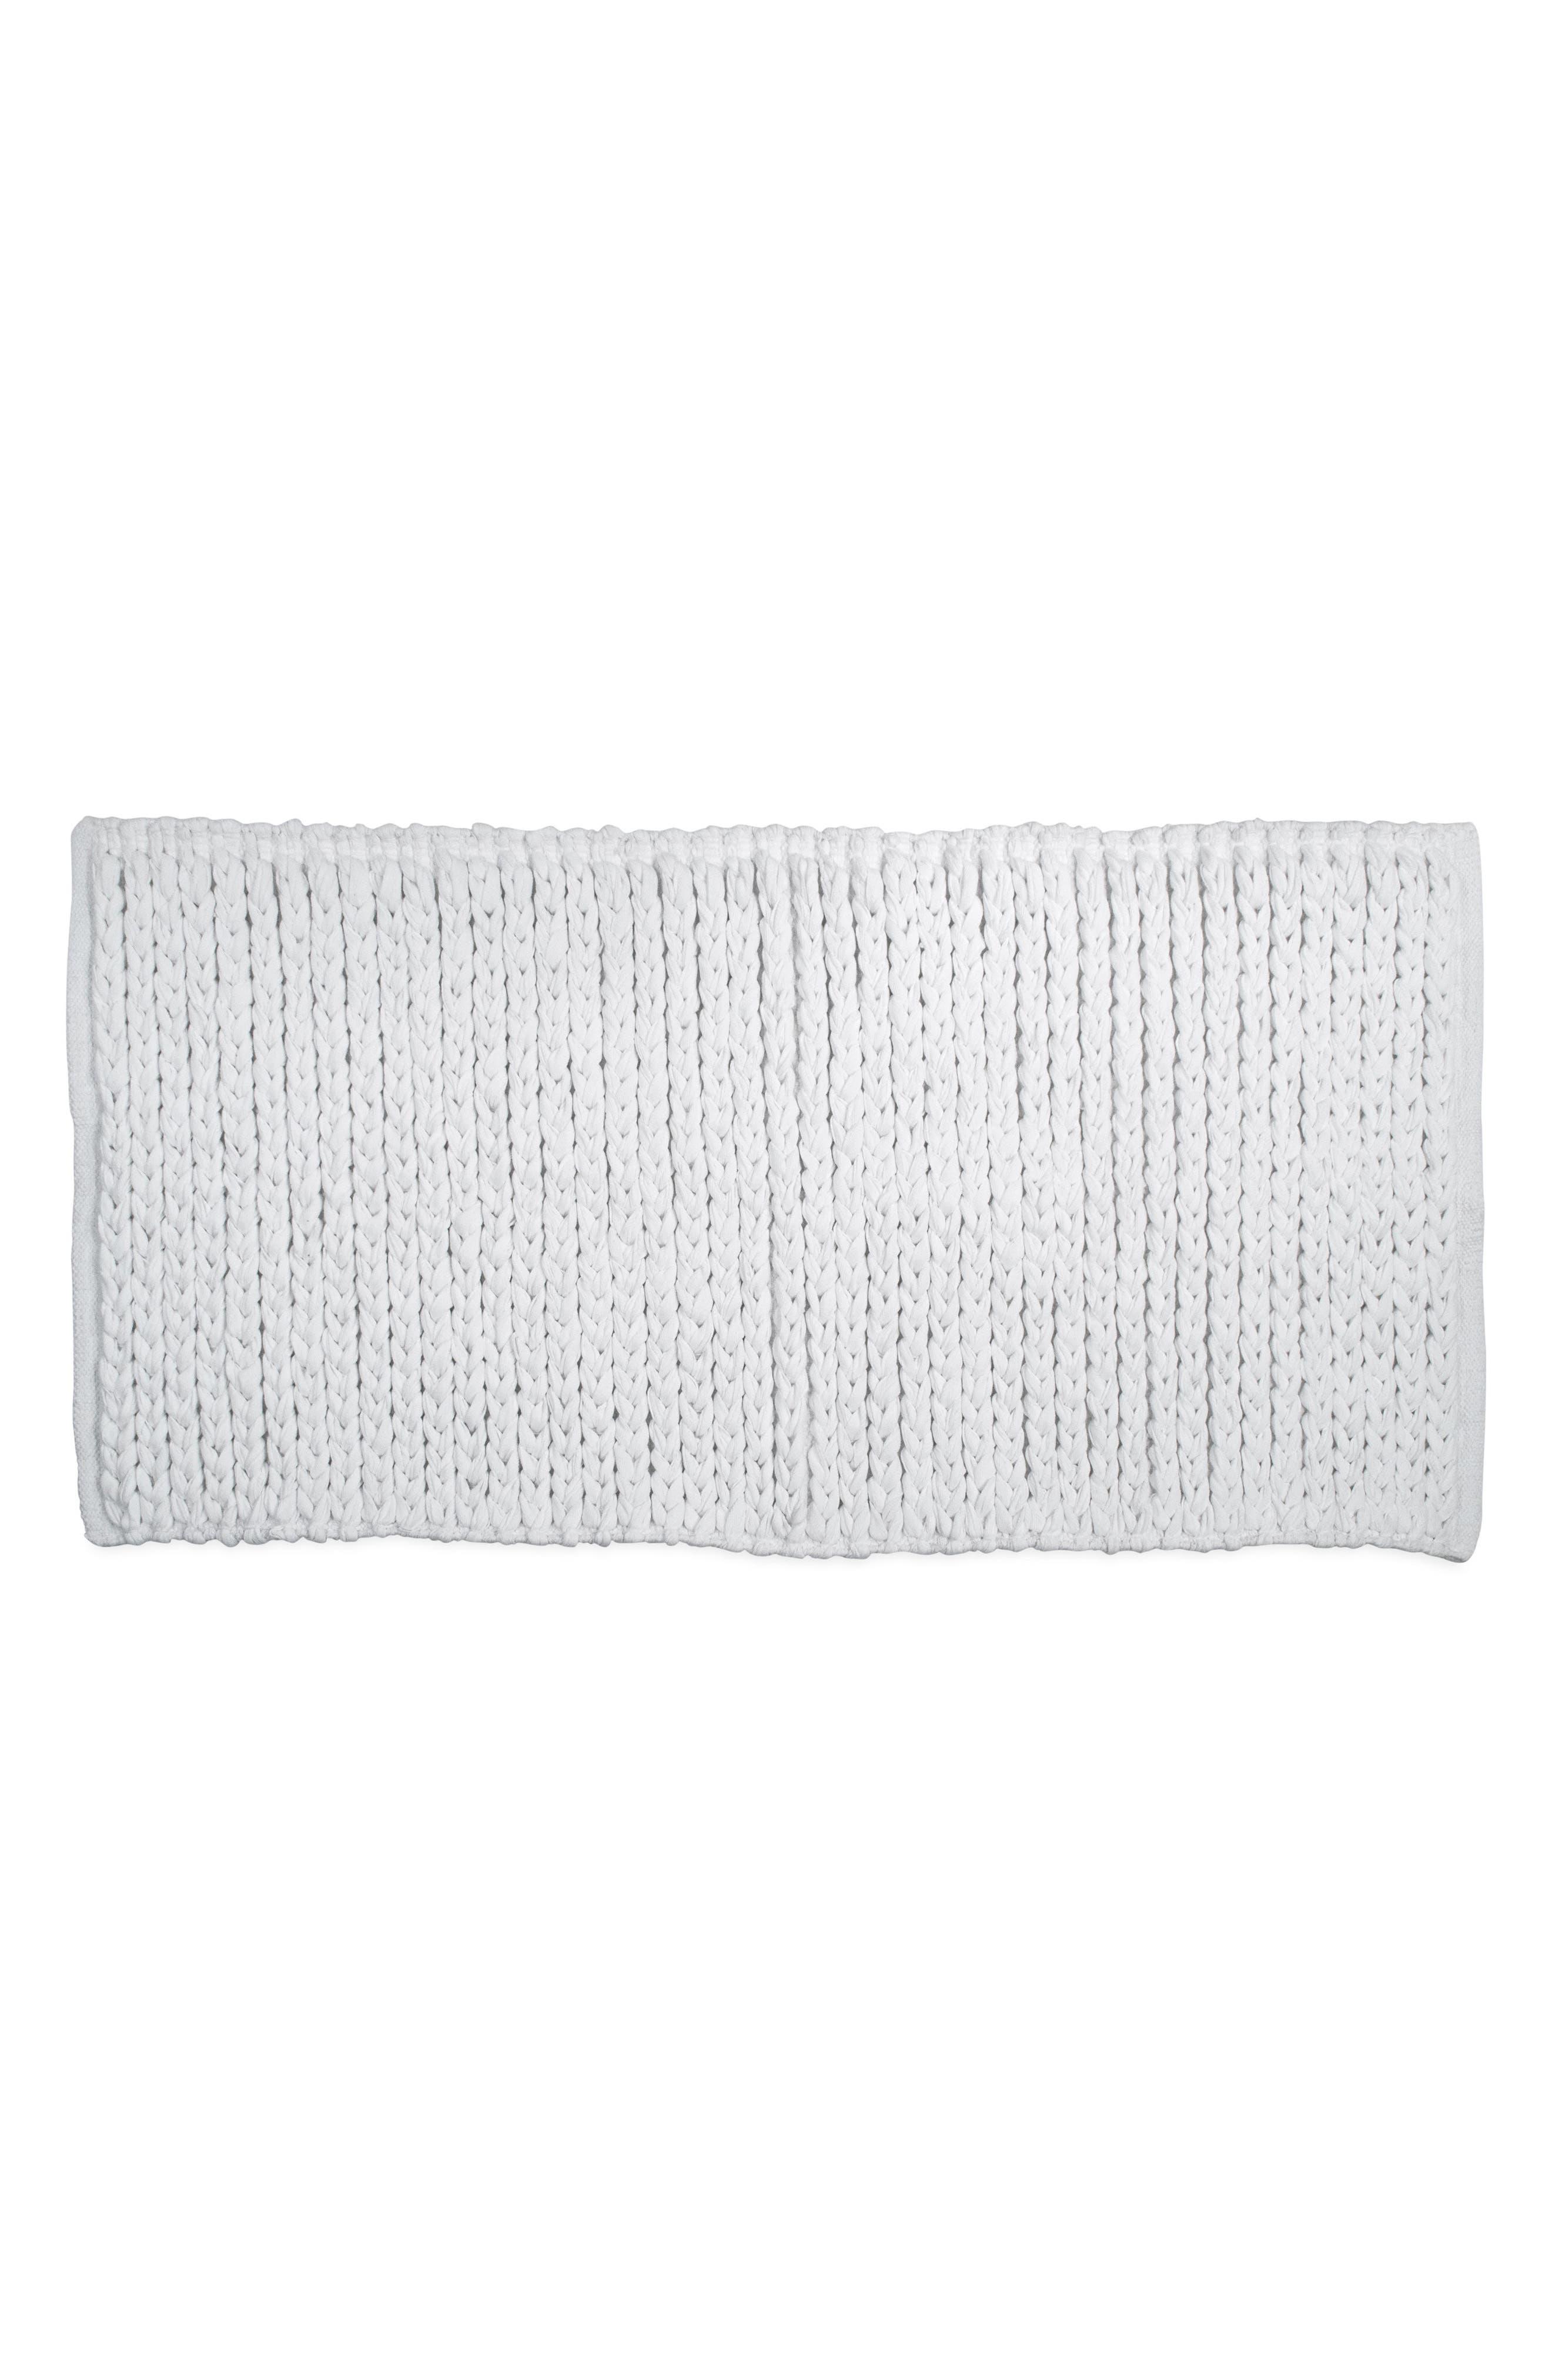 Bath Rug,                             Main thumbnail 1, color,                             White